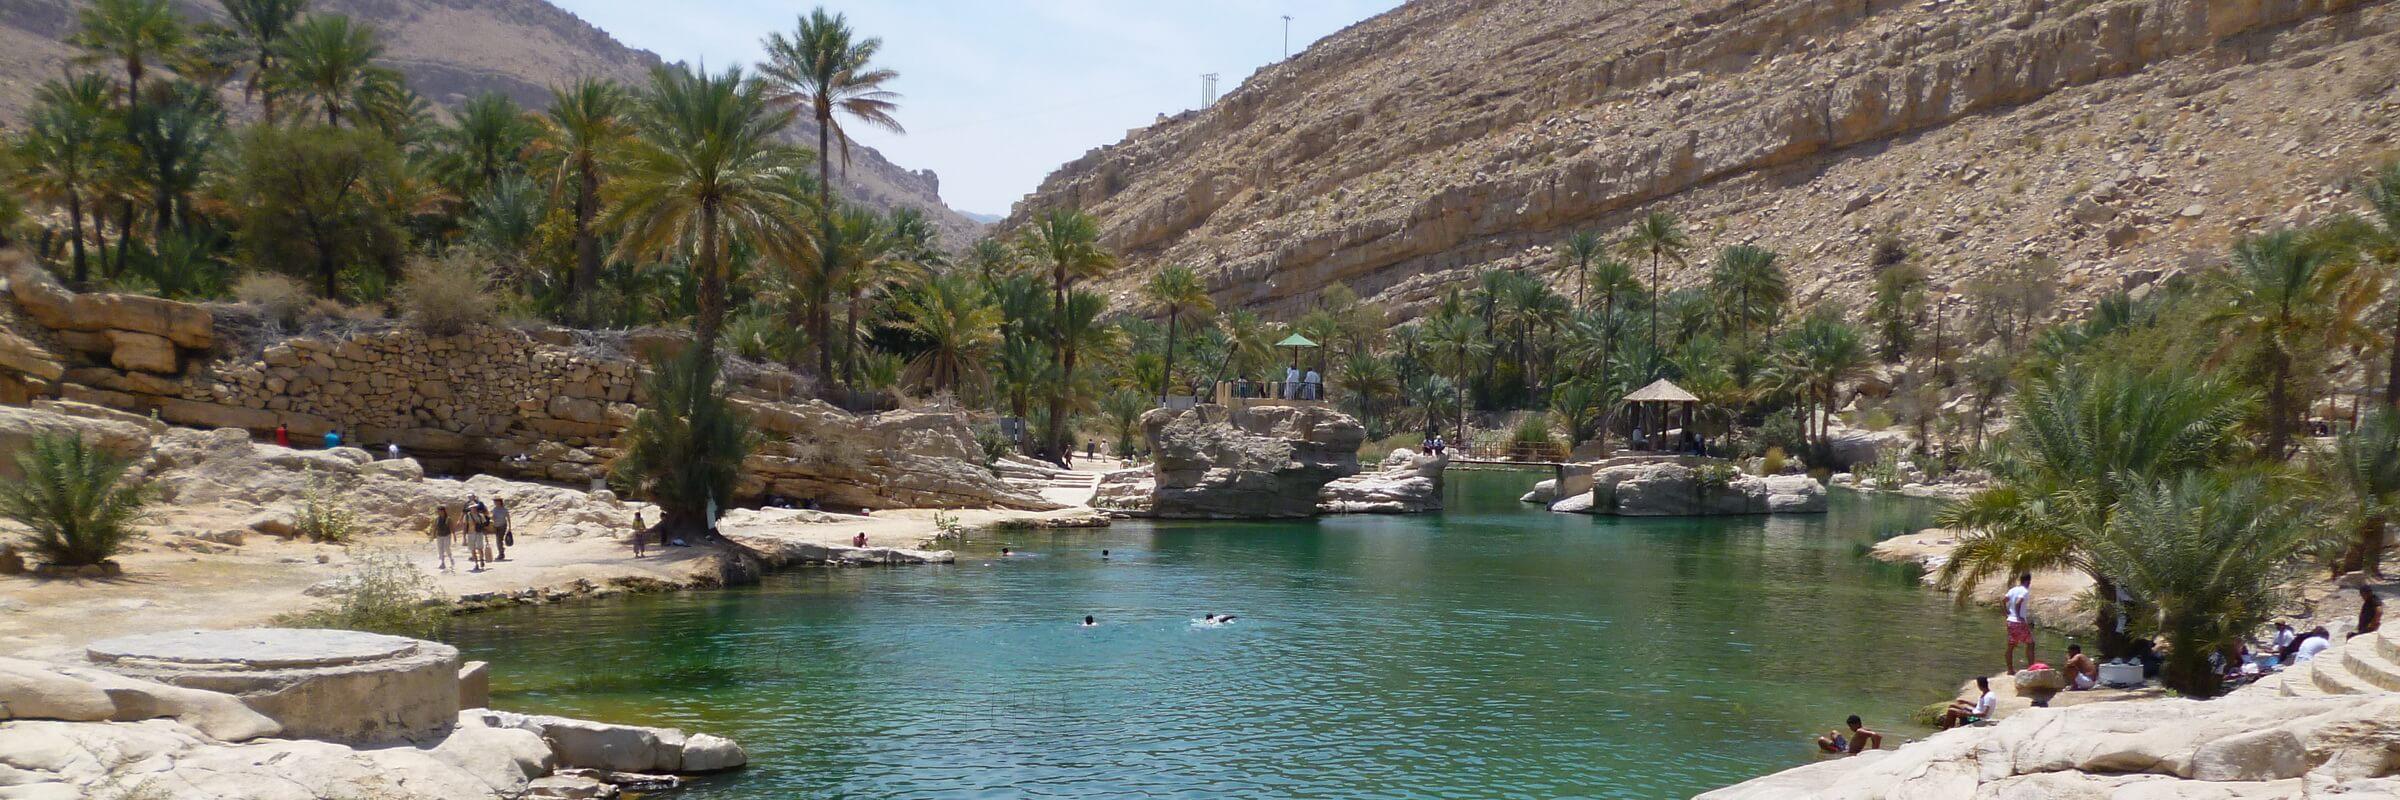 Beste Reisezeit Oman